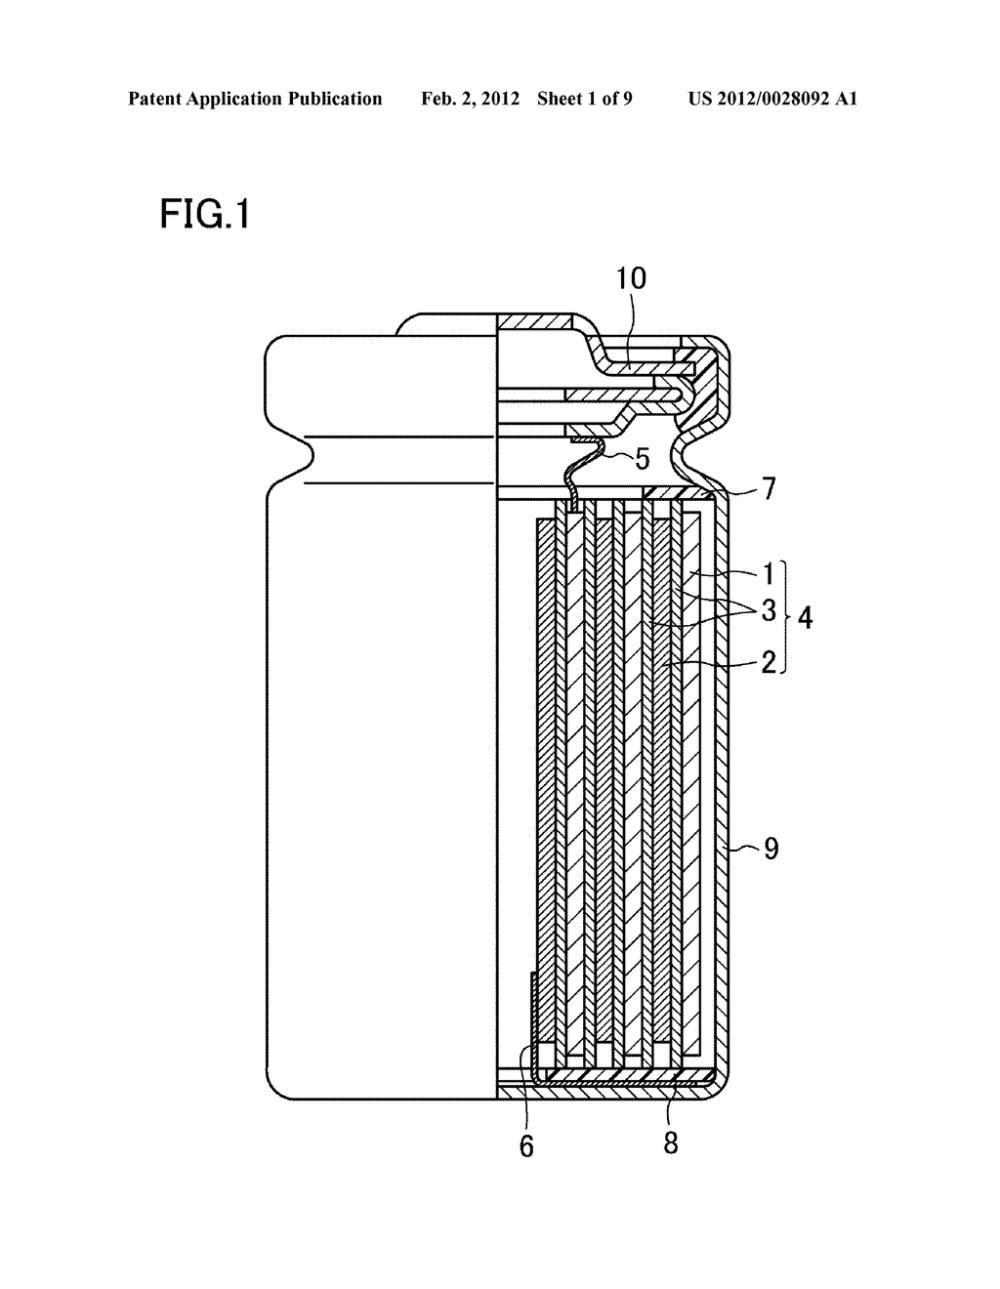 medium resolution of aa lithium primary battery and aaa lithium primary battery diagram schematic and image 02